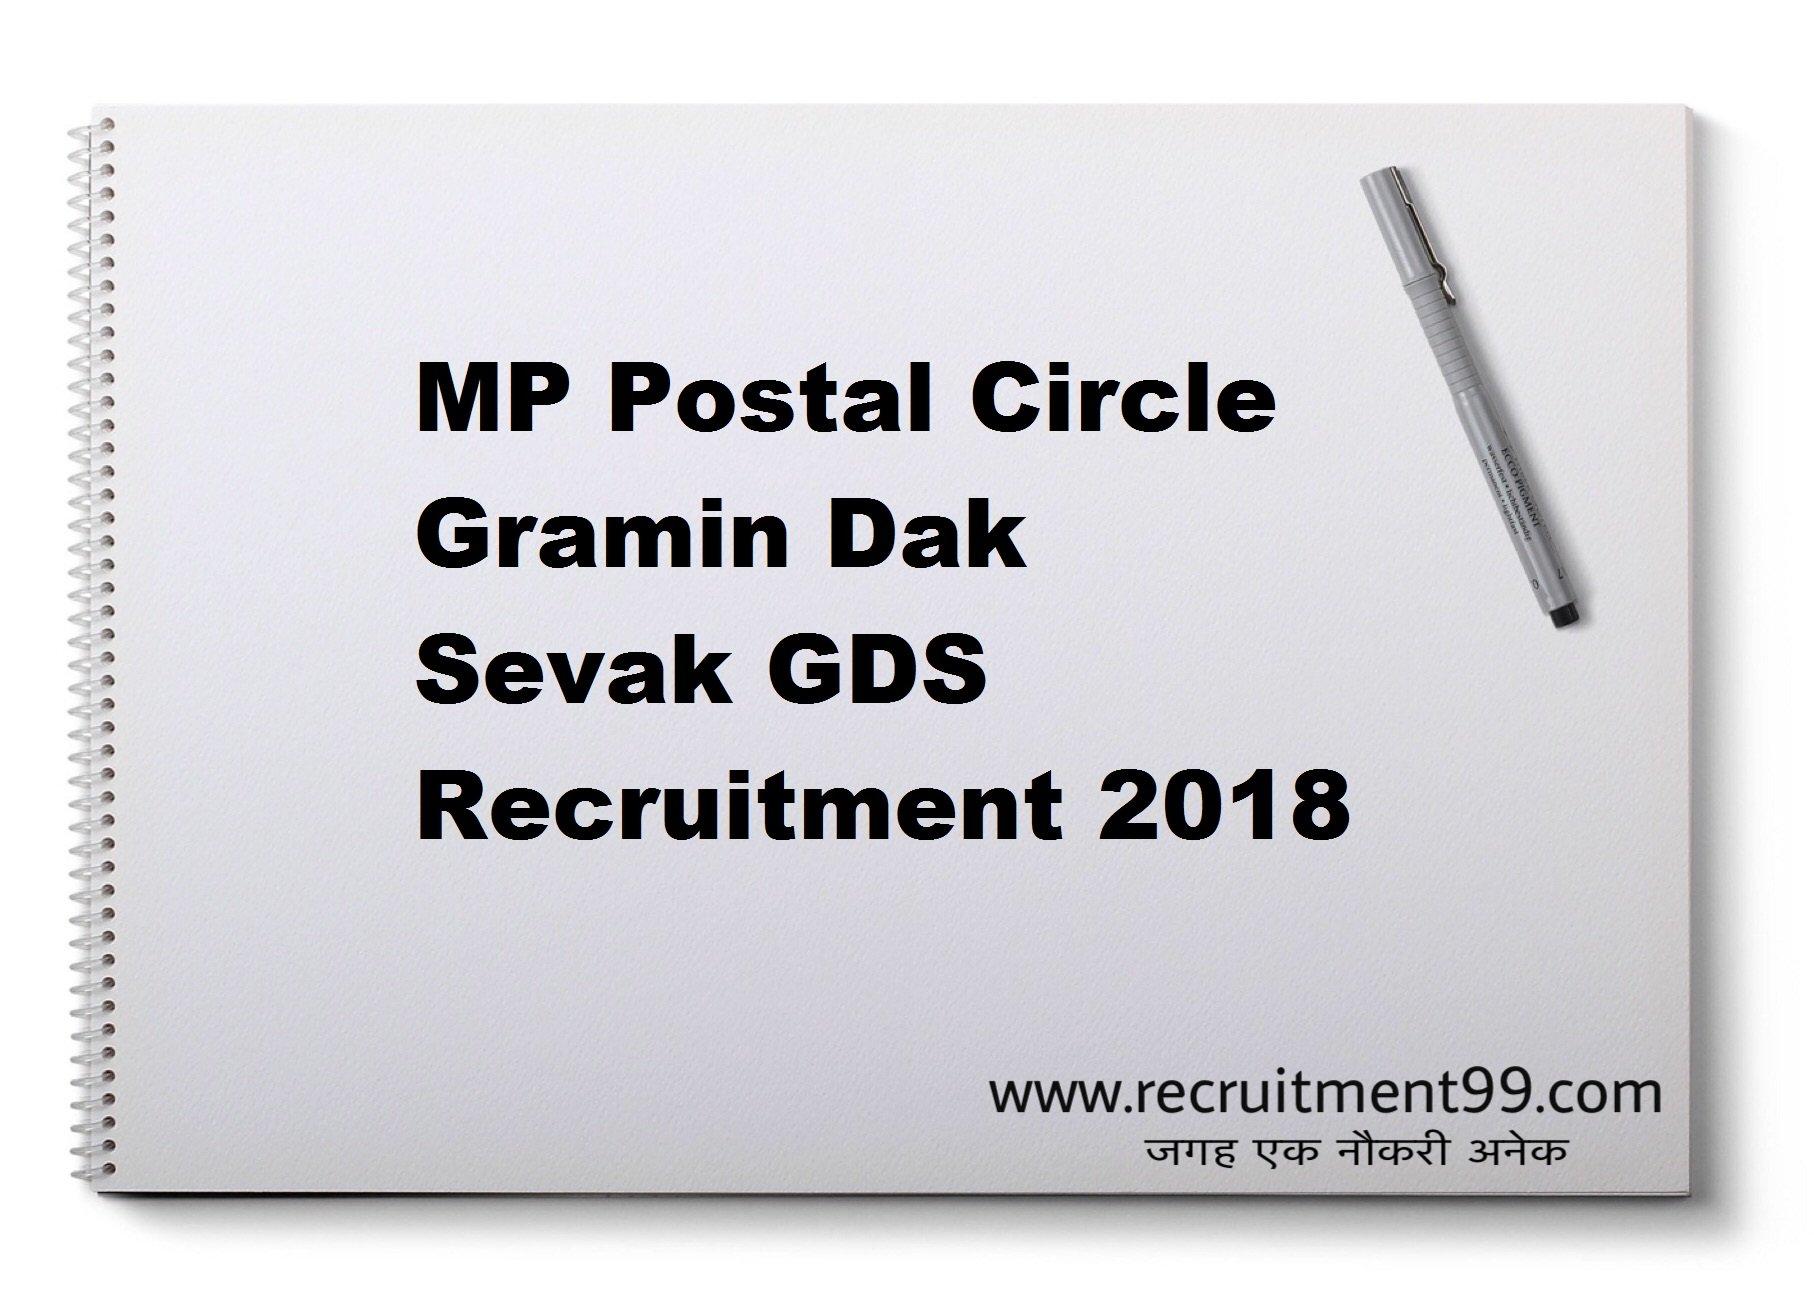 MP Postal Circle Gramin Dak Sevak GDS Recruitment Admit Card Result 2018